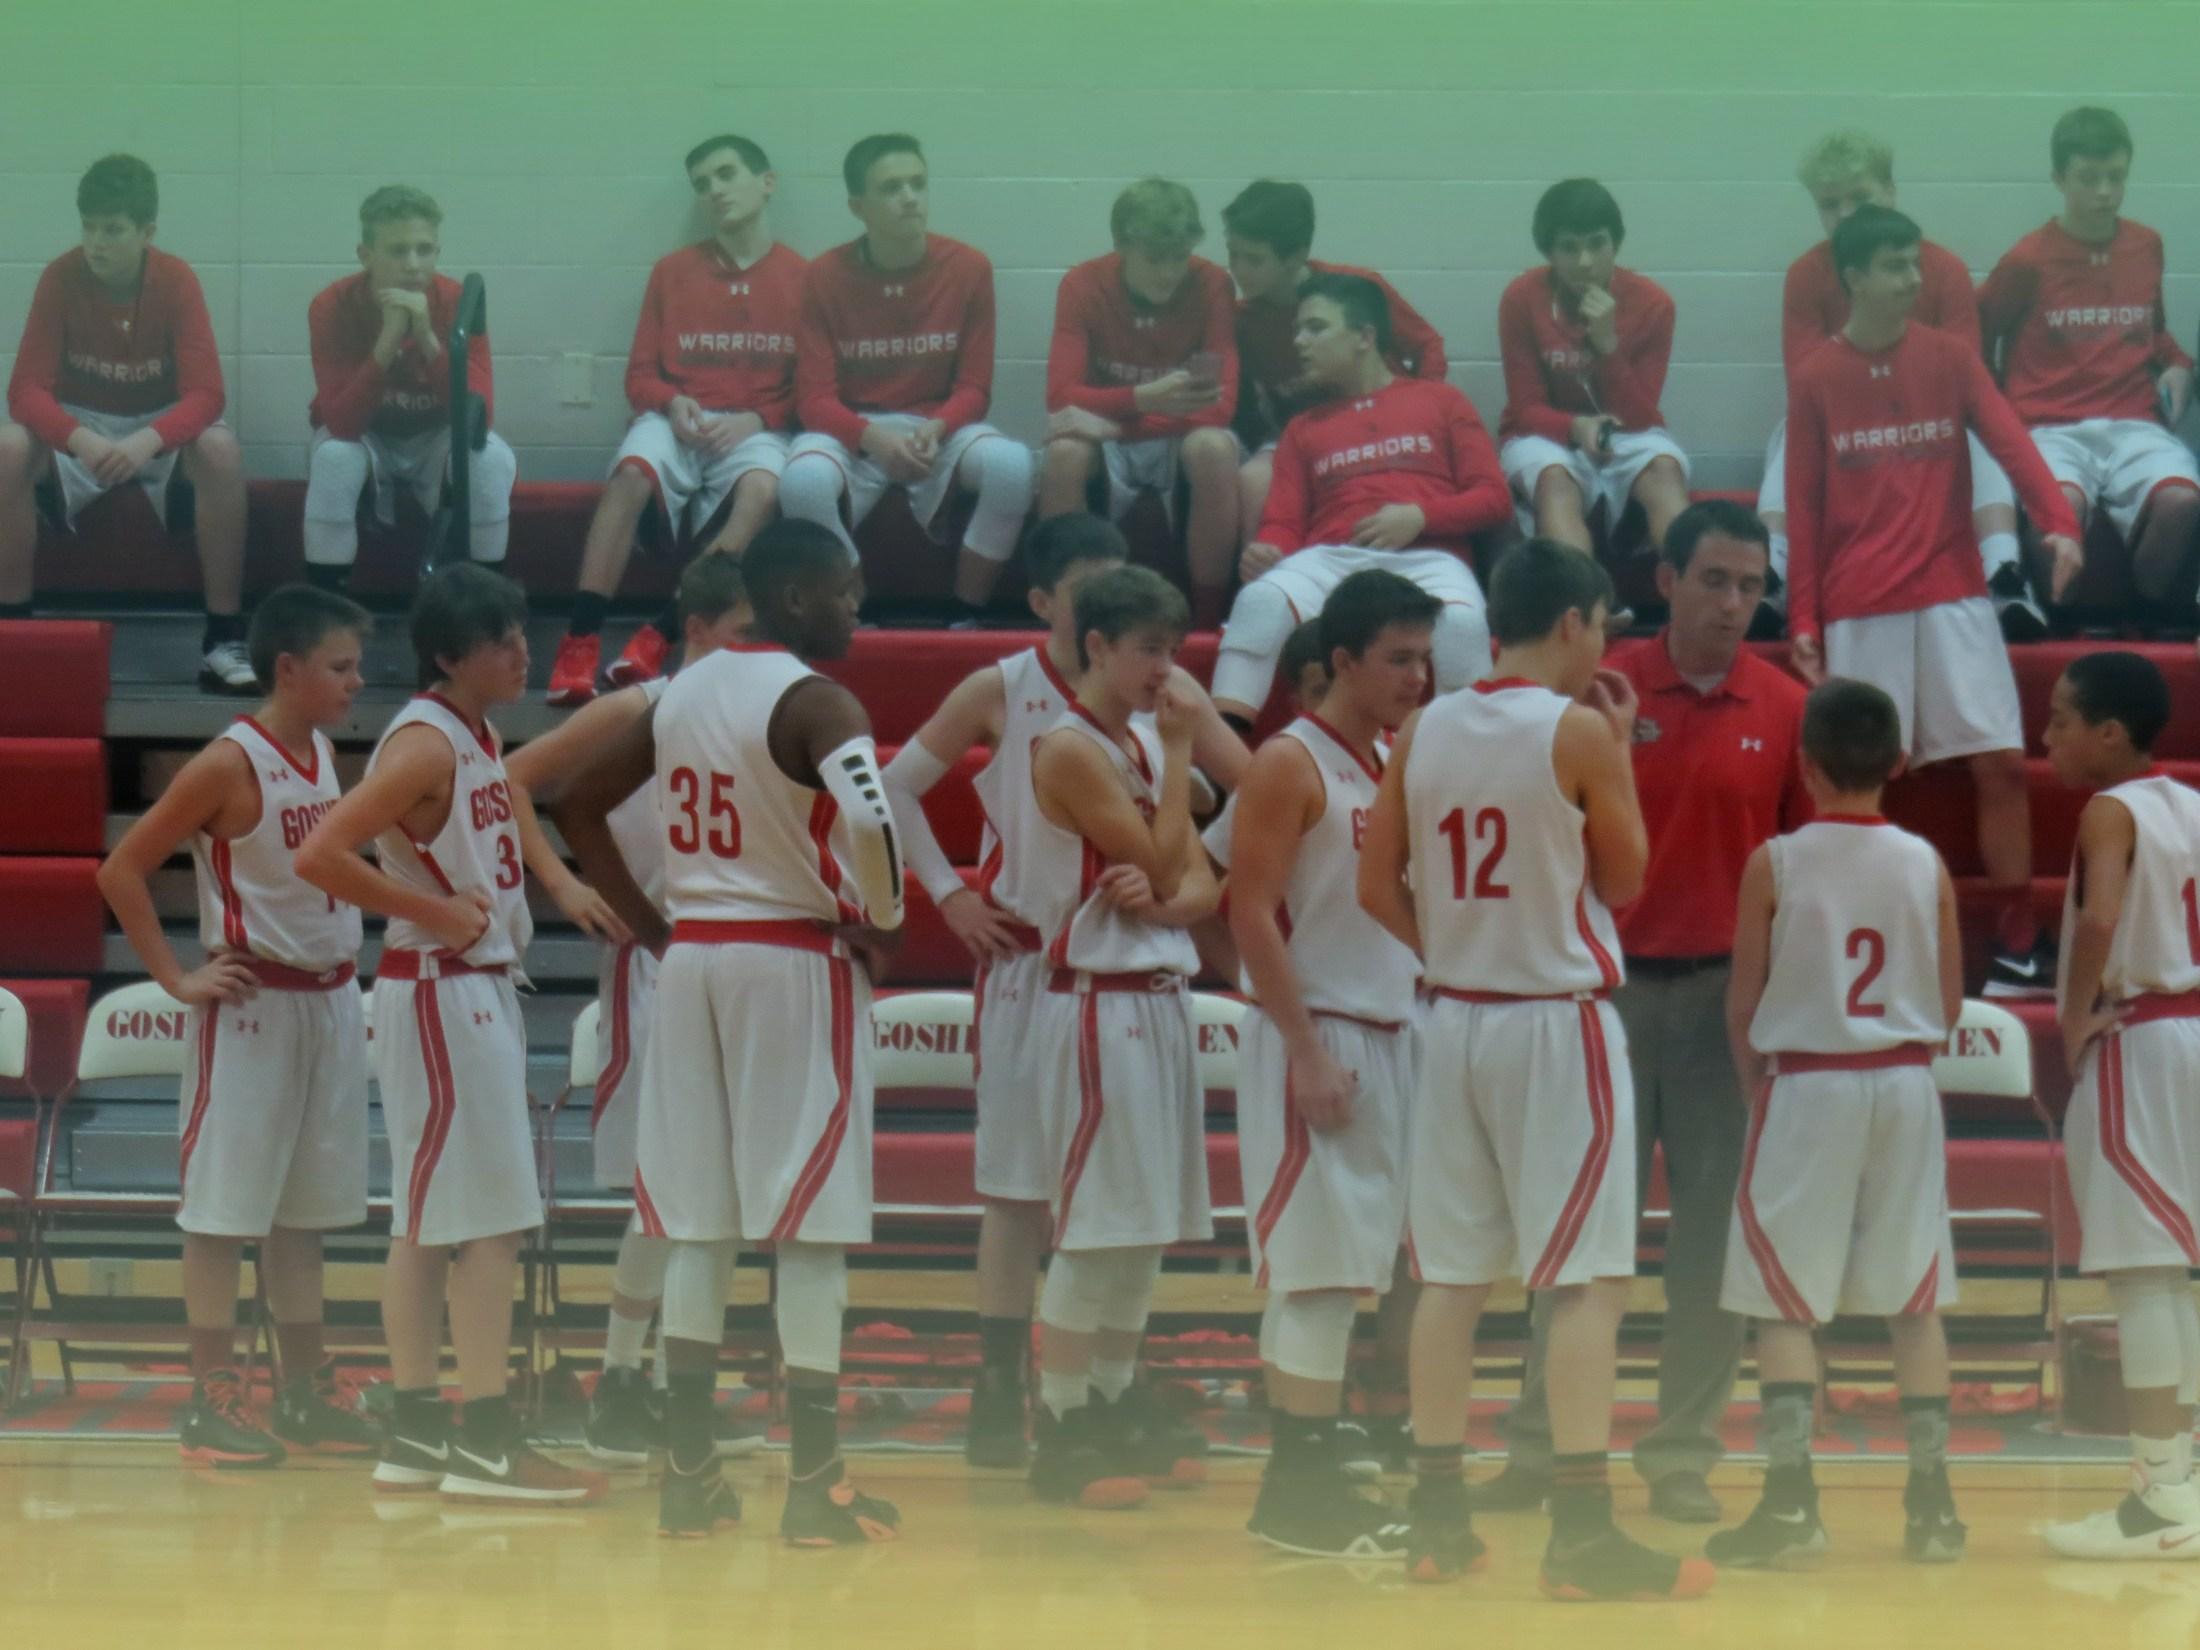 7th grade boys basketball team